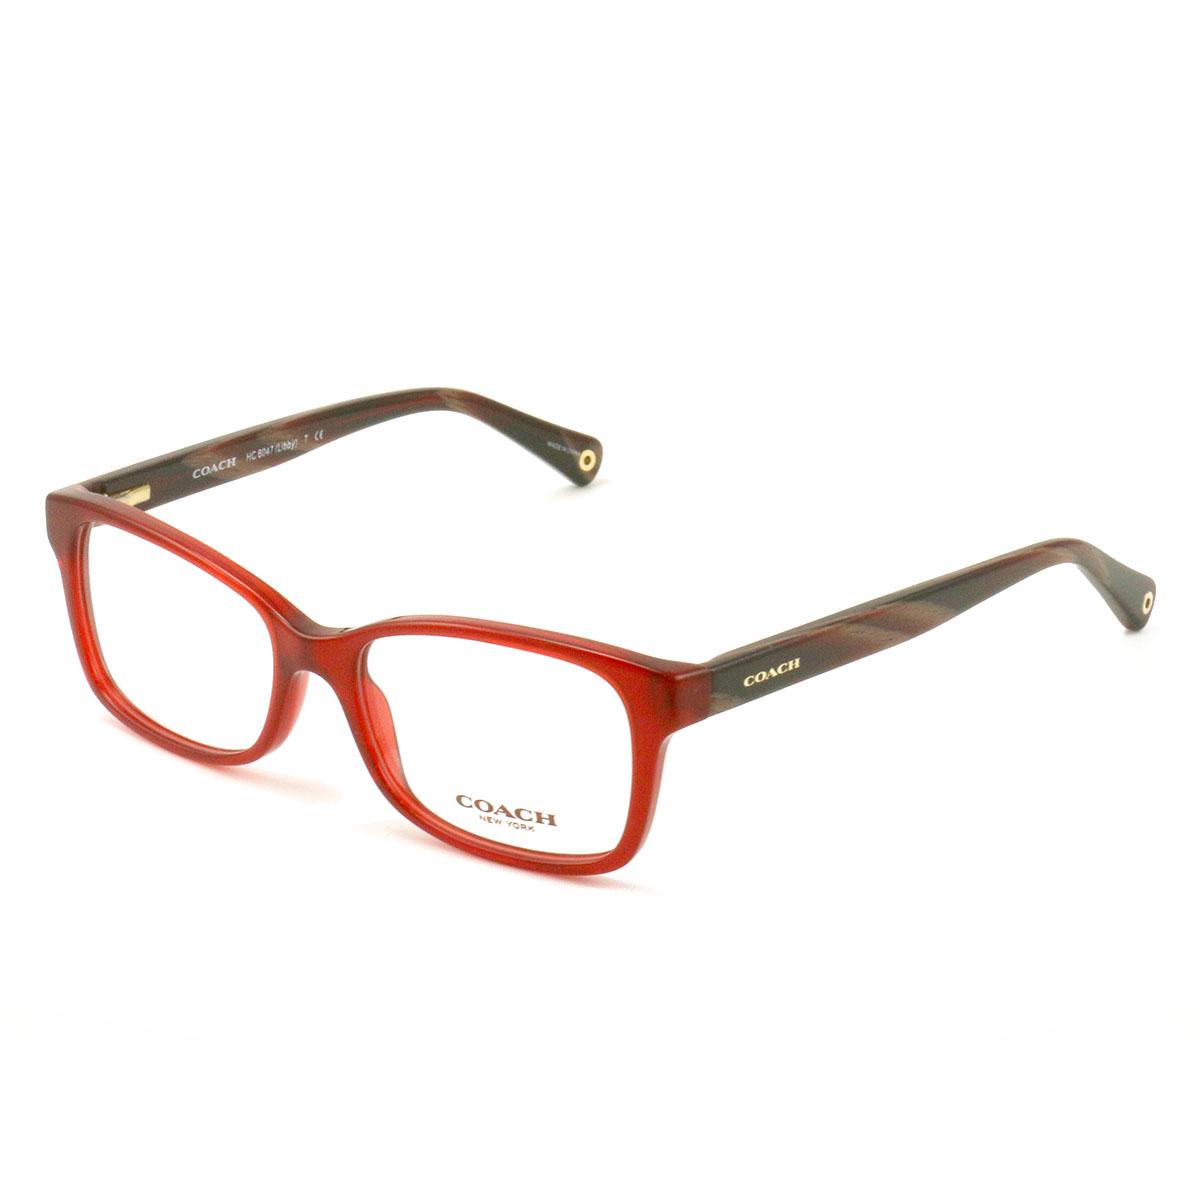 822d42257f COACH 6047 5206 Eyeglasses Milky Burgundy Burgundy Horn 51 16 135 Demo Lens